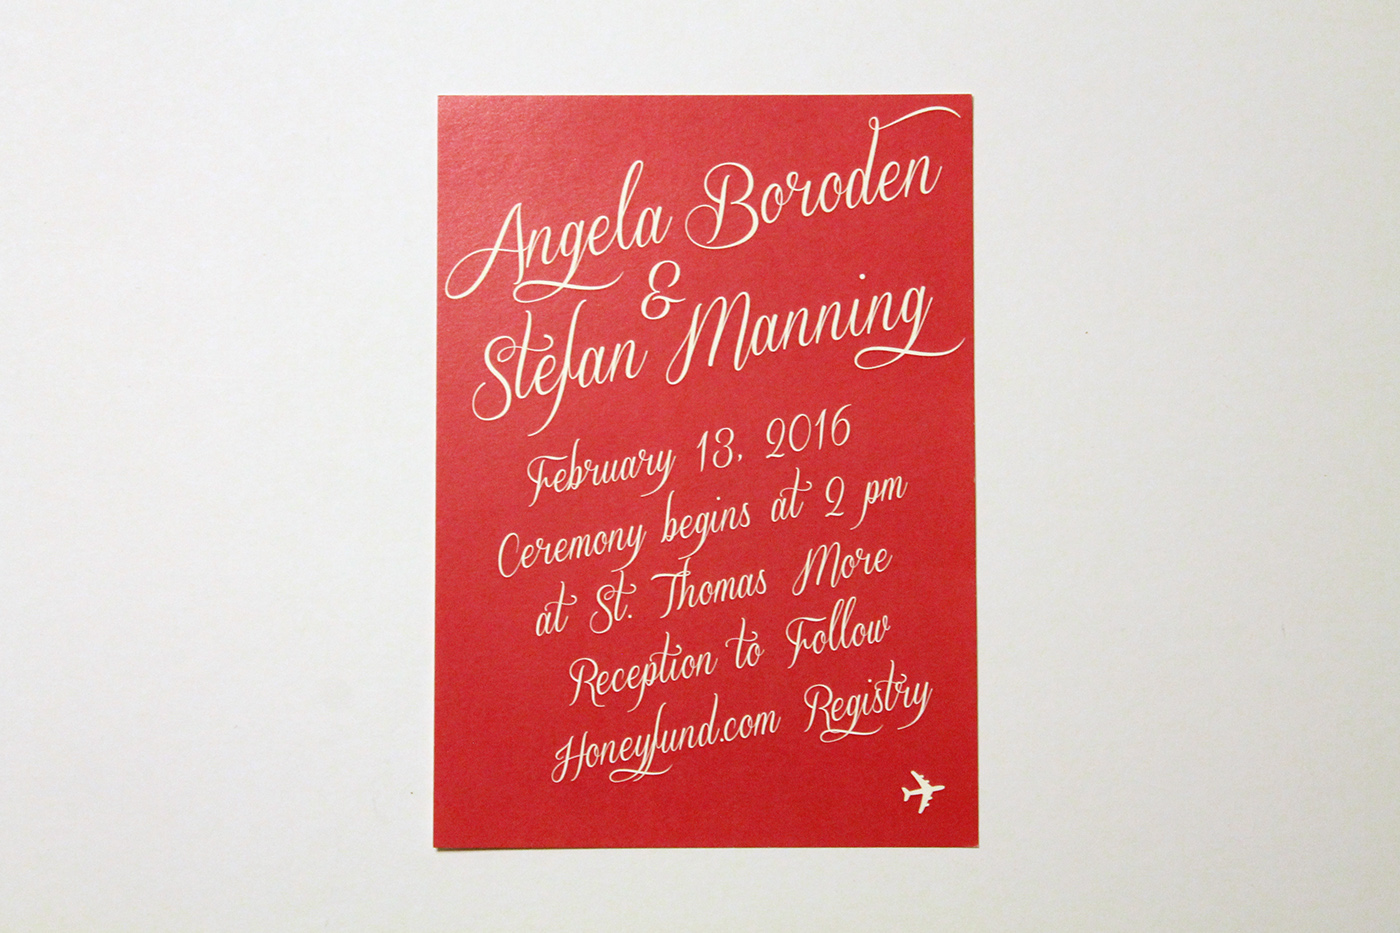 Wedding Stationery: Angela & Stefan on Behance